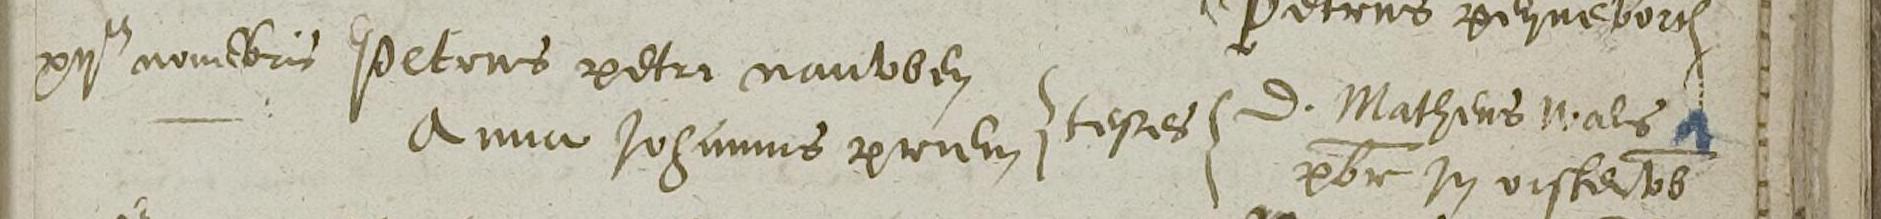 Huwelijk Petrus Petrus Nauwen en Anna Johannes Priem 12 nov 1598